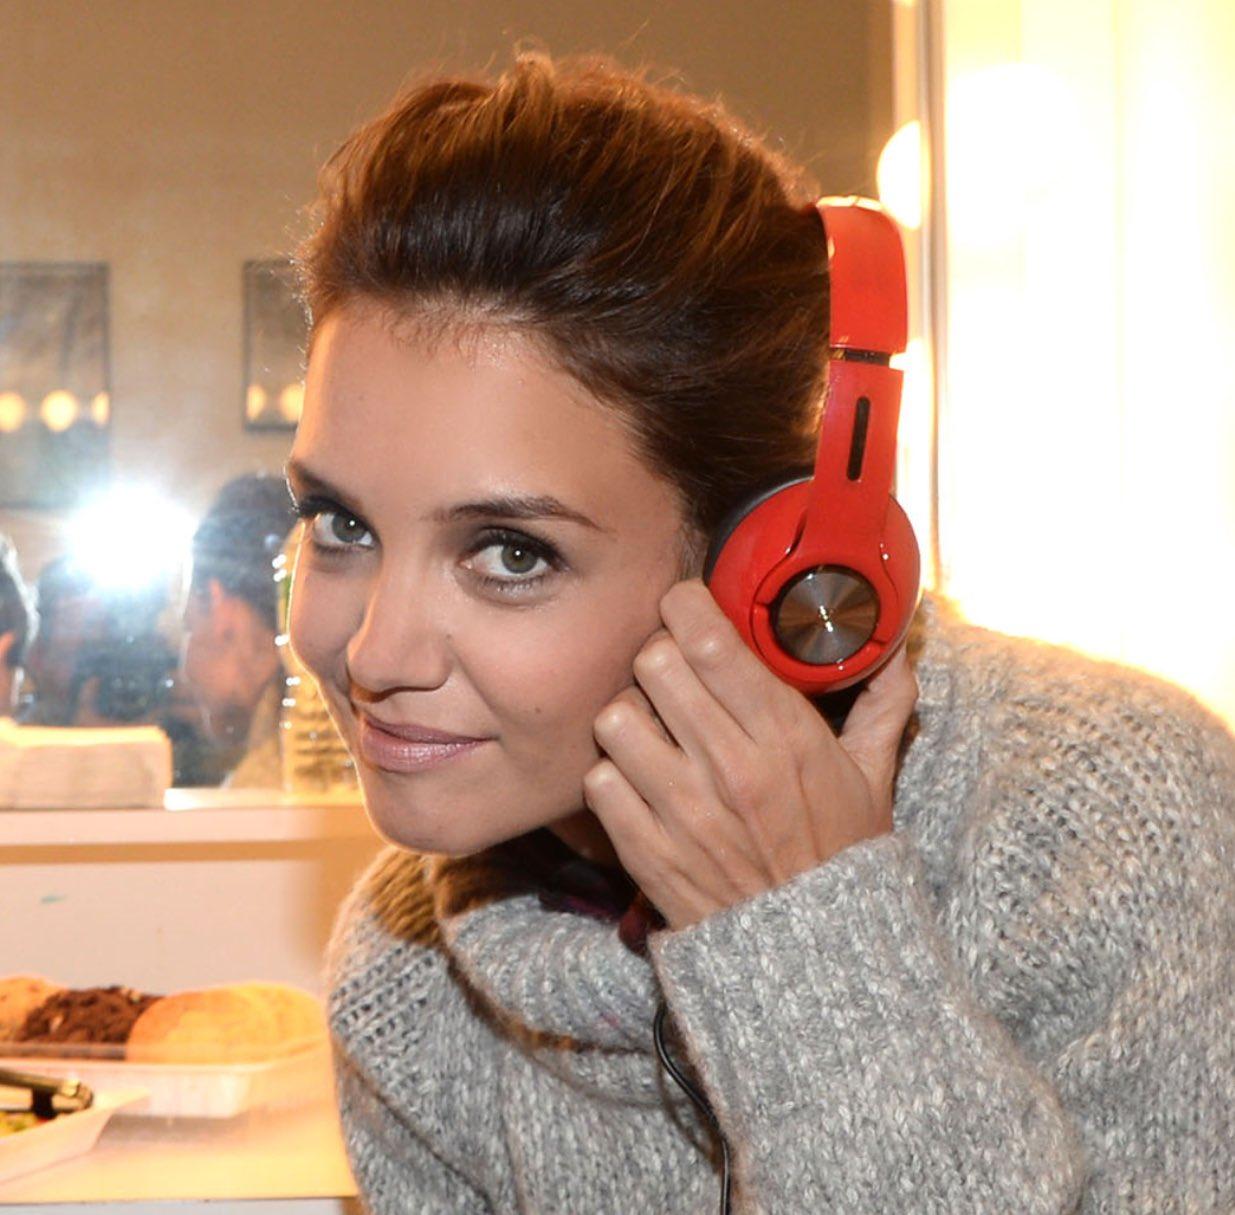 #HowToTalkToAWomanWHeadphones tell her you got the Scientology plug https://t.co/OiHaILhRaZ